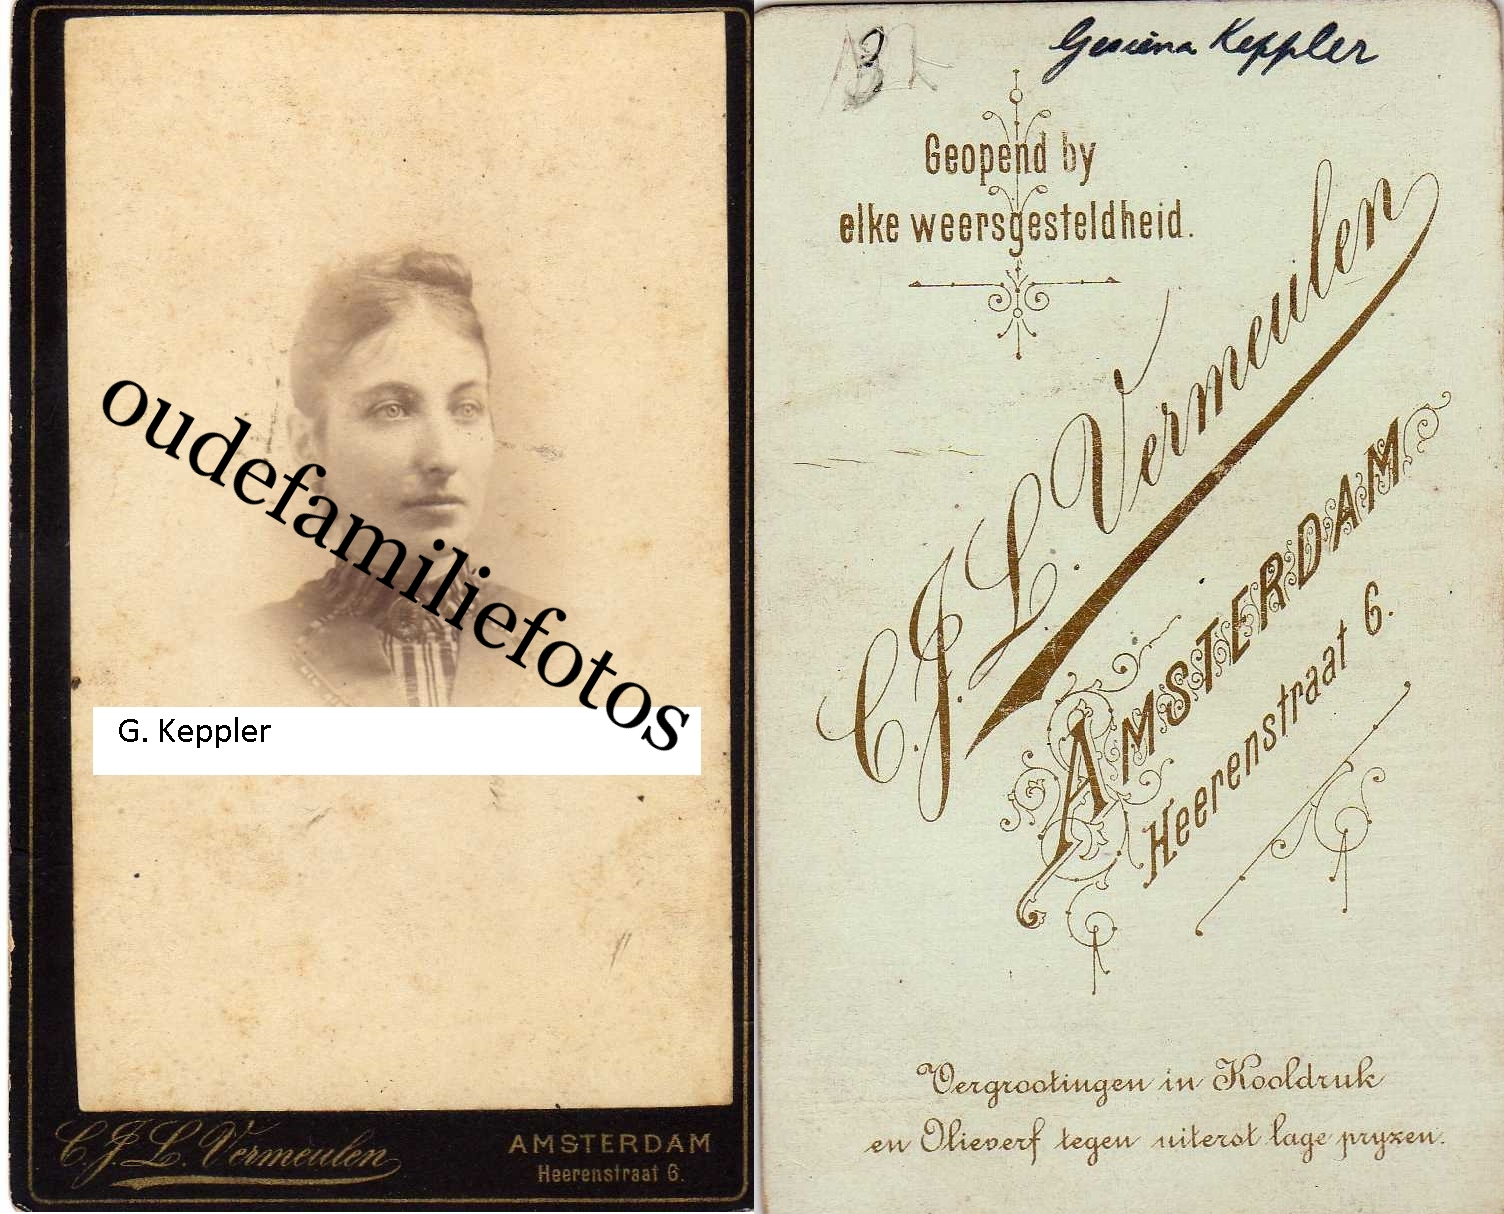 Keppler, Gesina geb. 23-3-1866 A'dam ovl. 12-11-1895 Den-Haag. Moeder M.C Lugt € 2,00